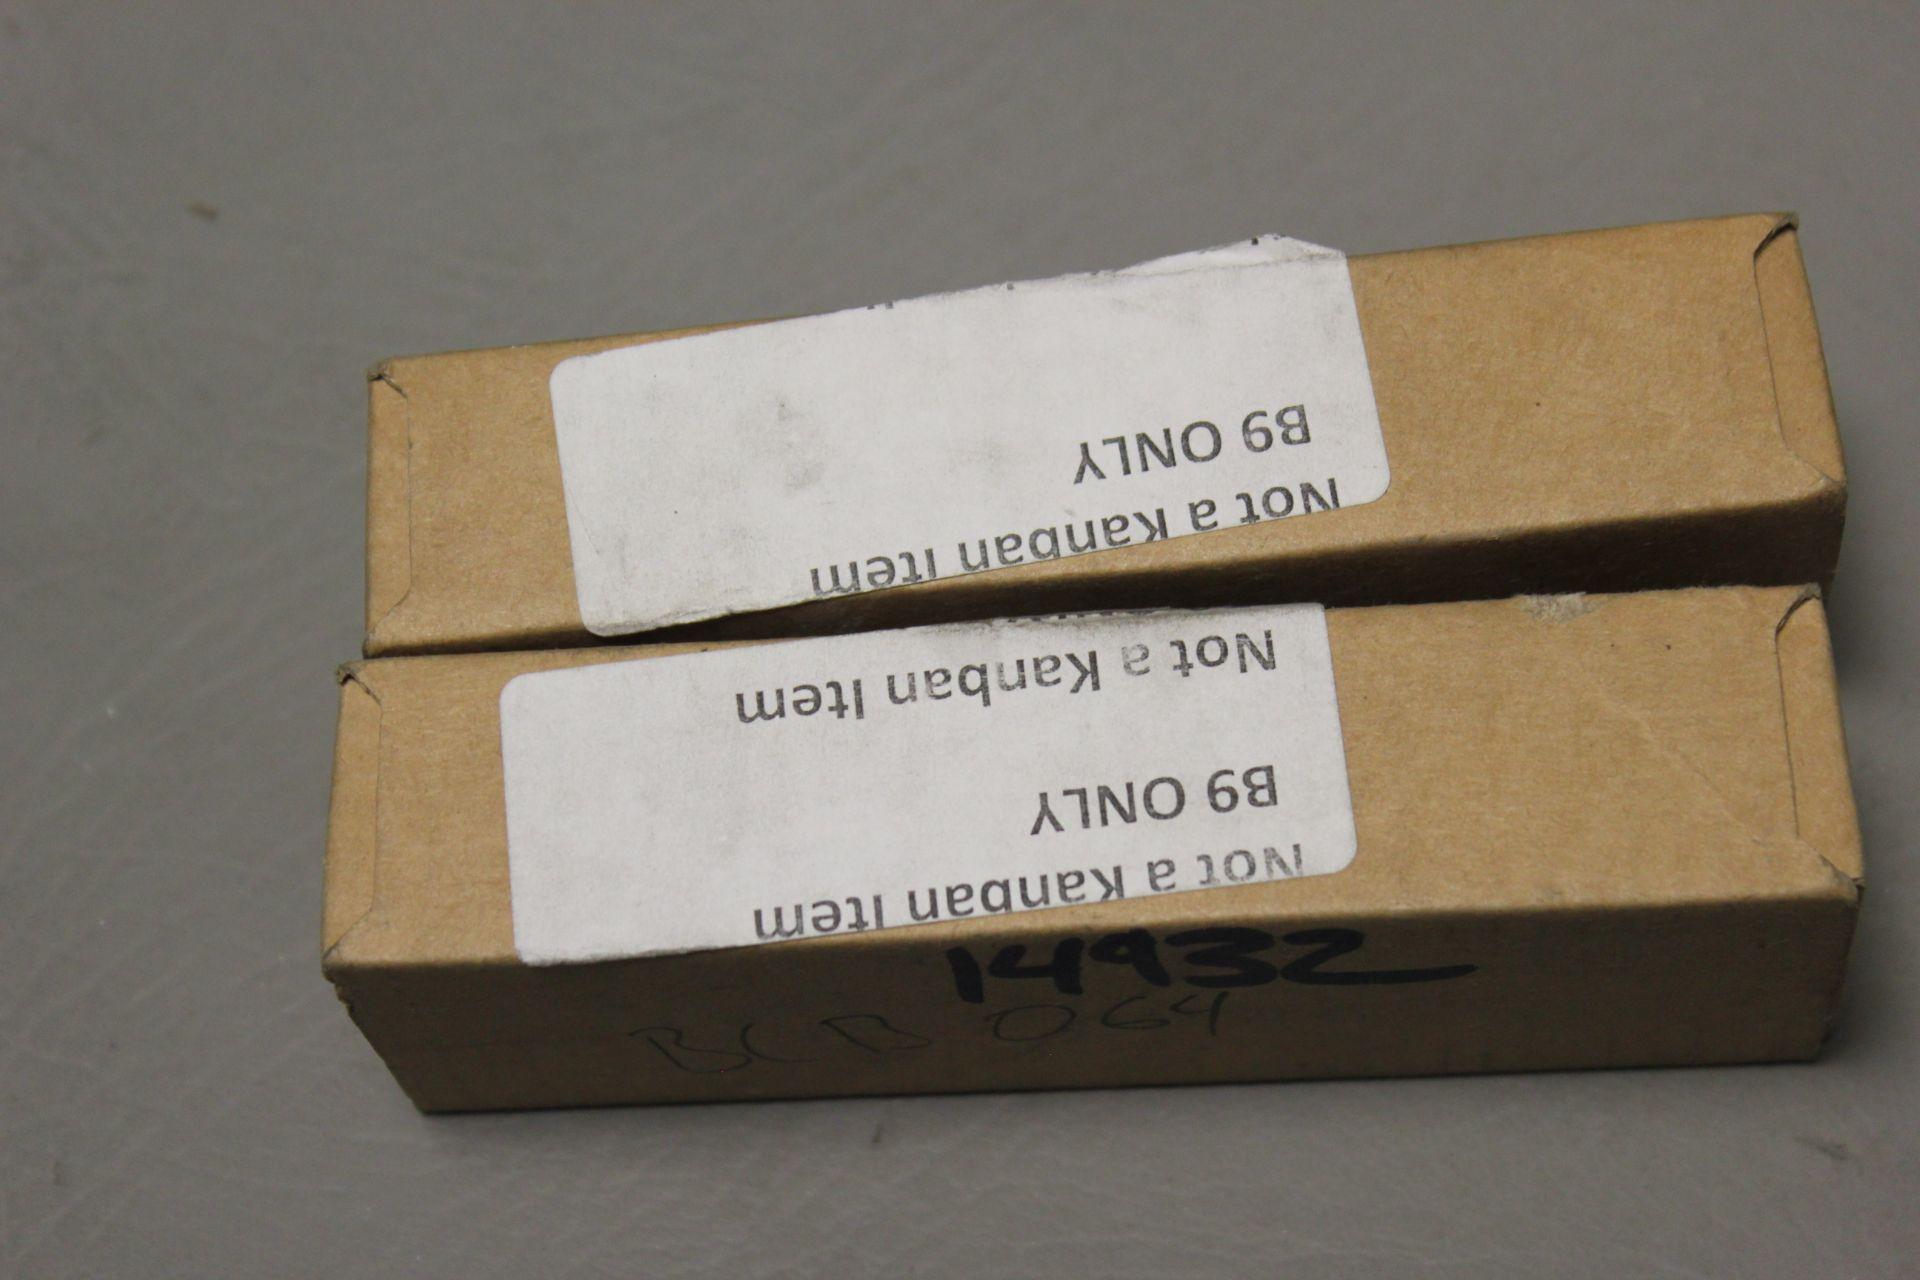 LOT OF NEW SIEMENS PLC BASE UNITS - Image 3 of 5